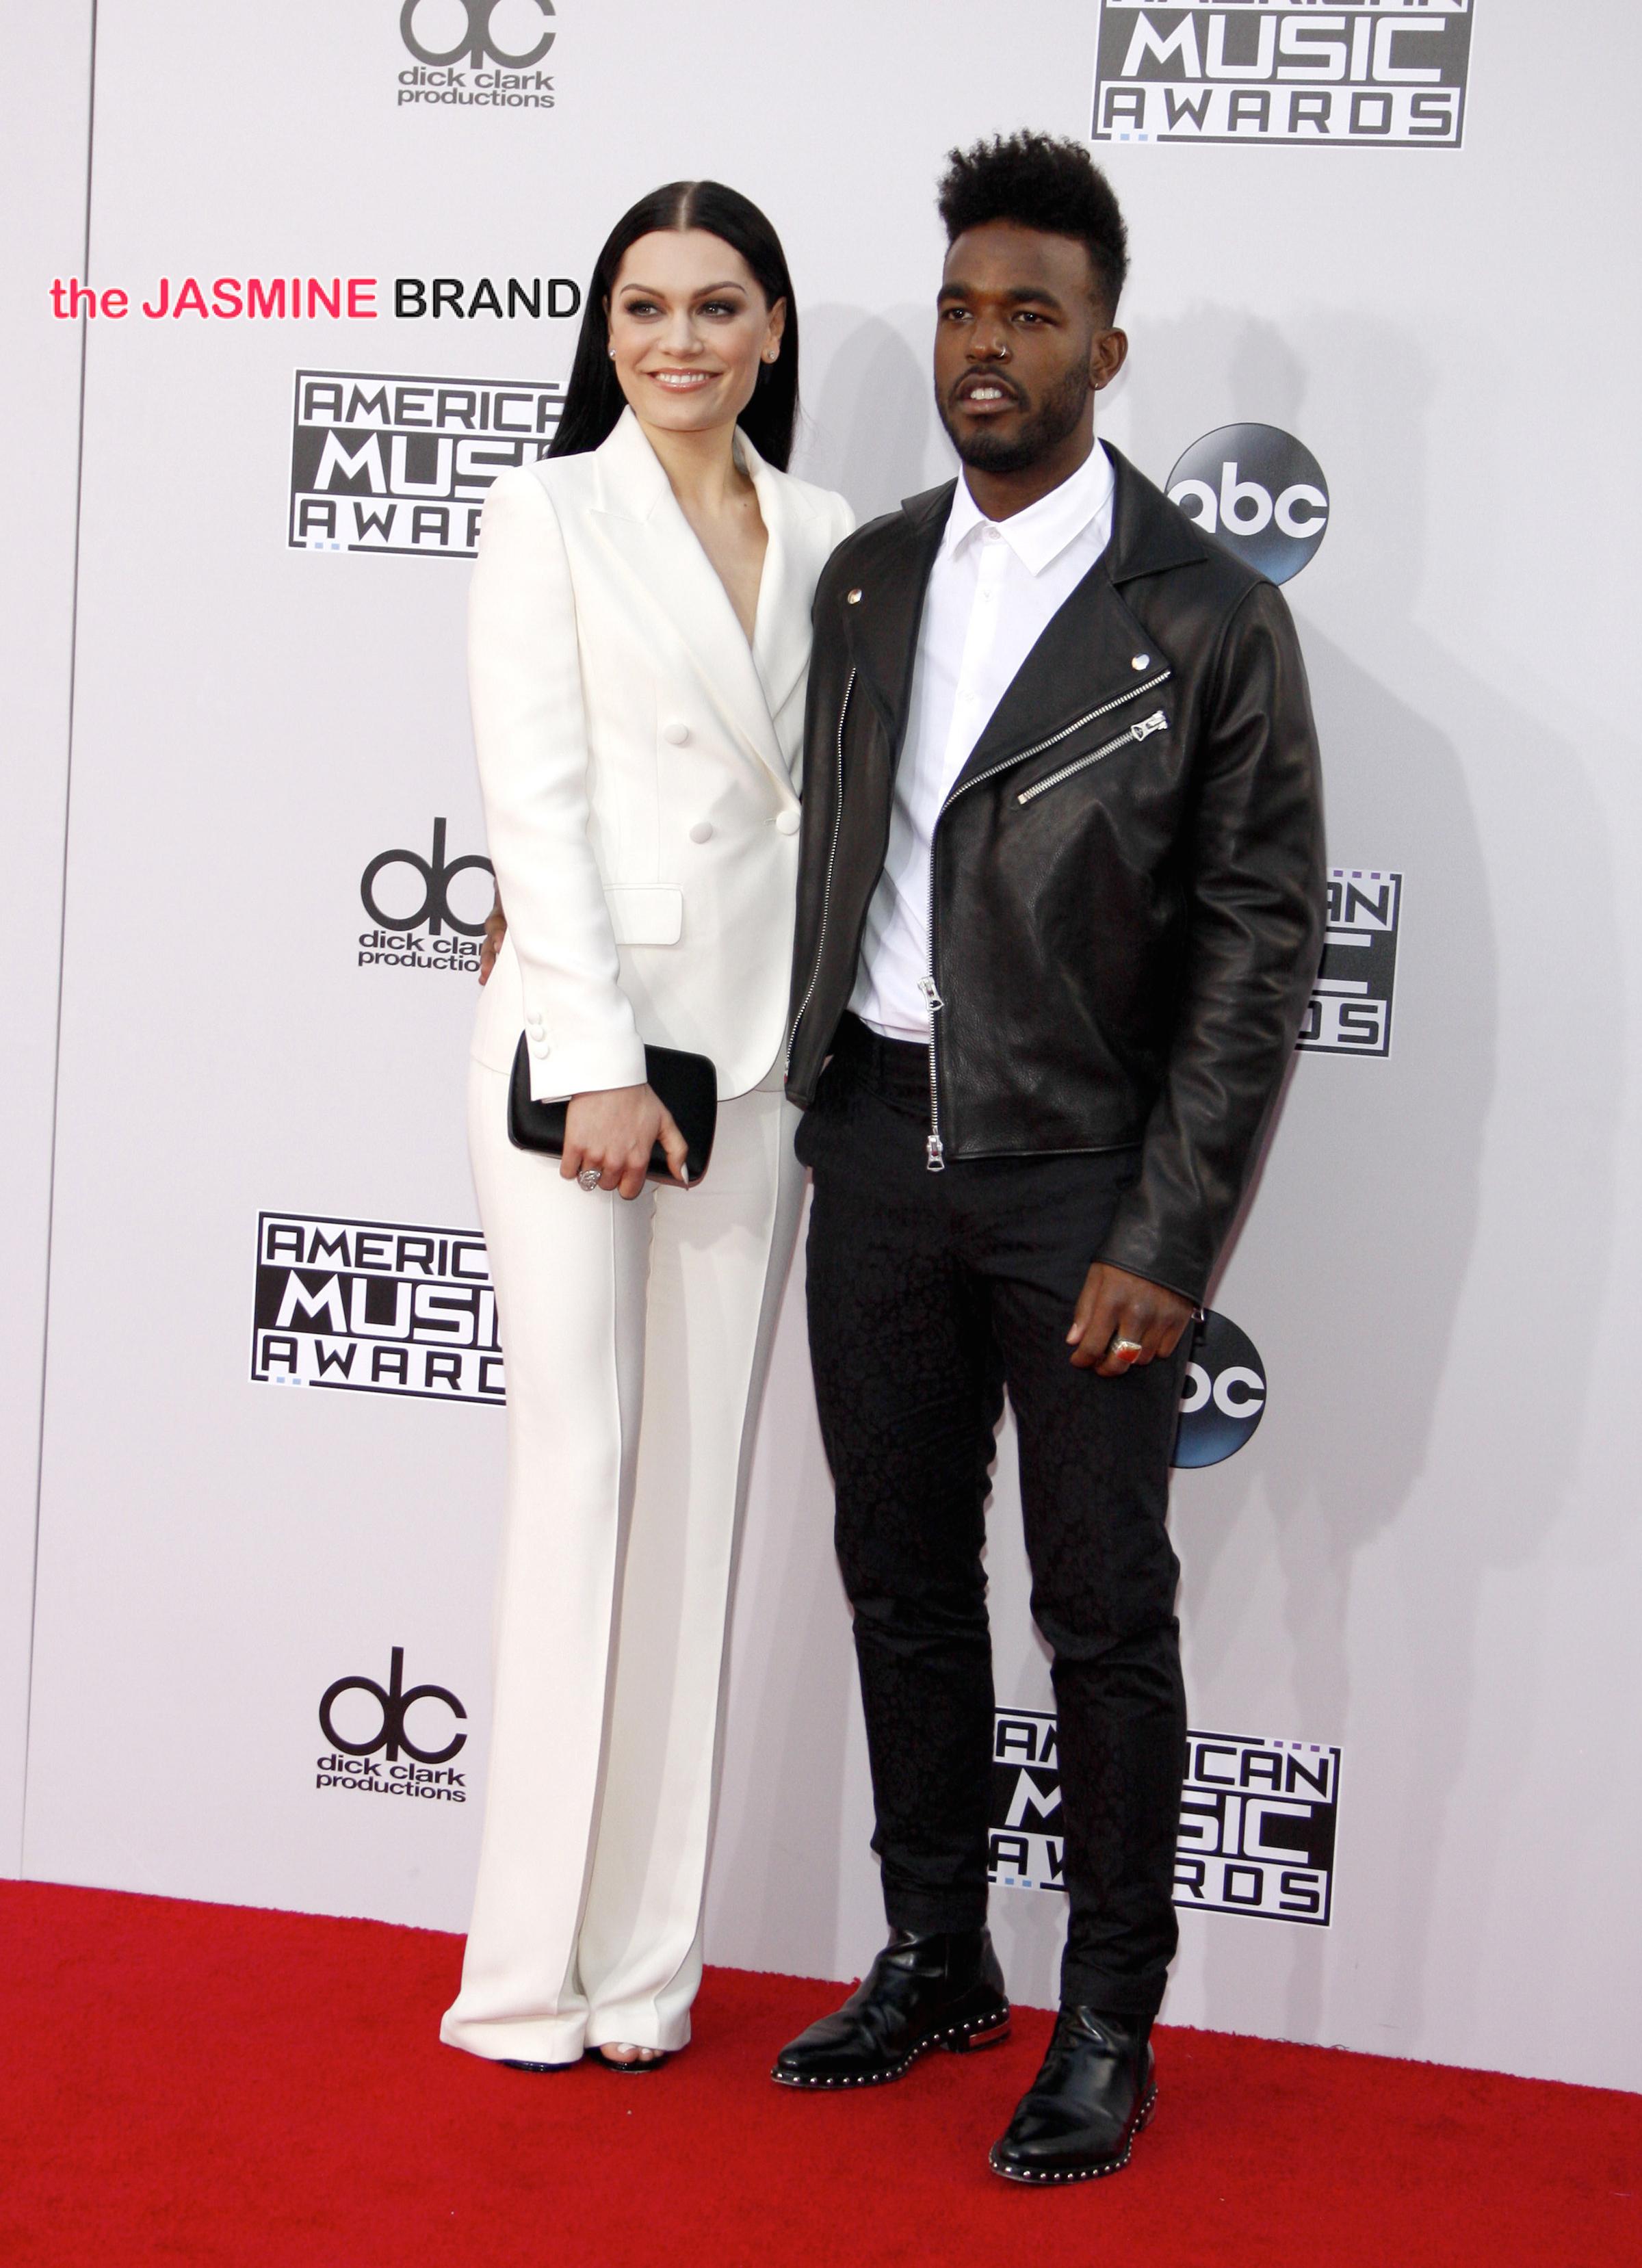 2014 American Music Awards - Red Carpet